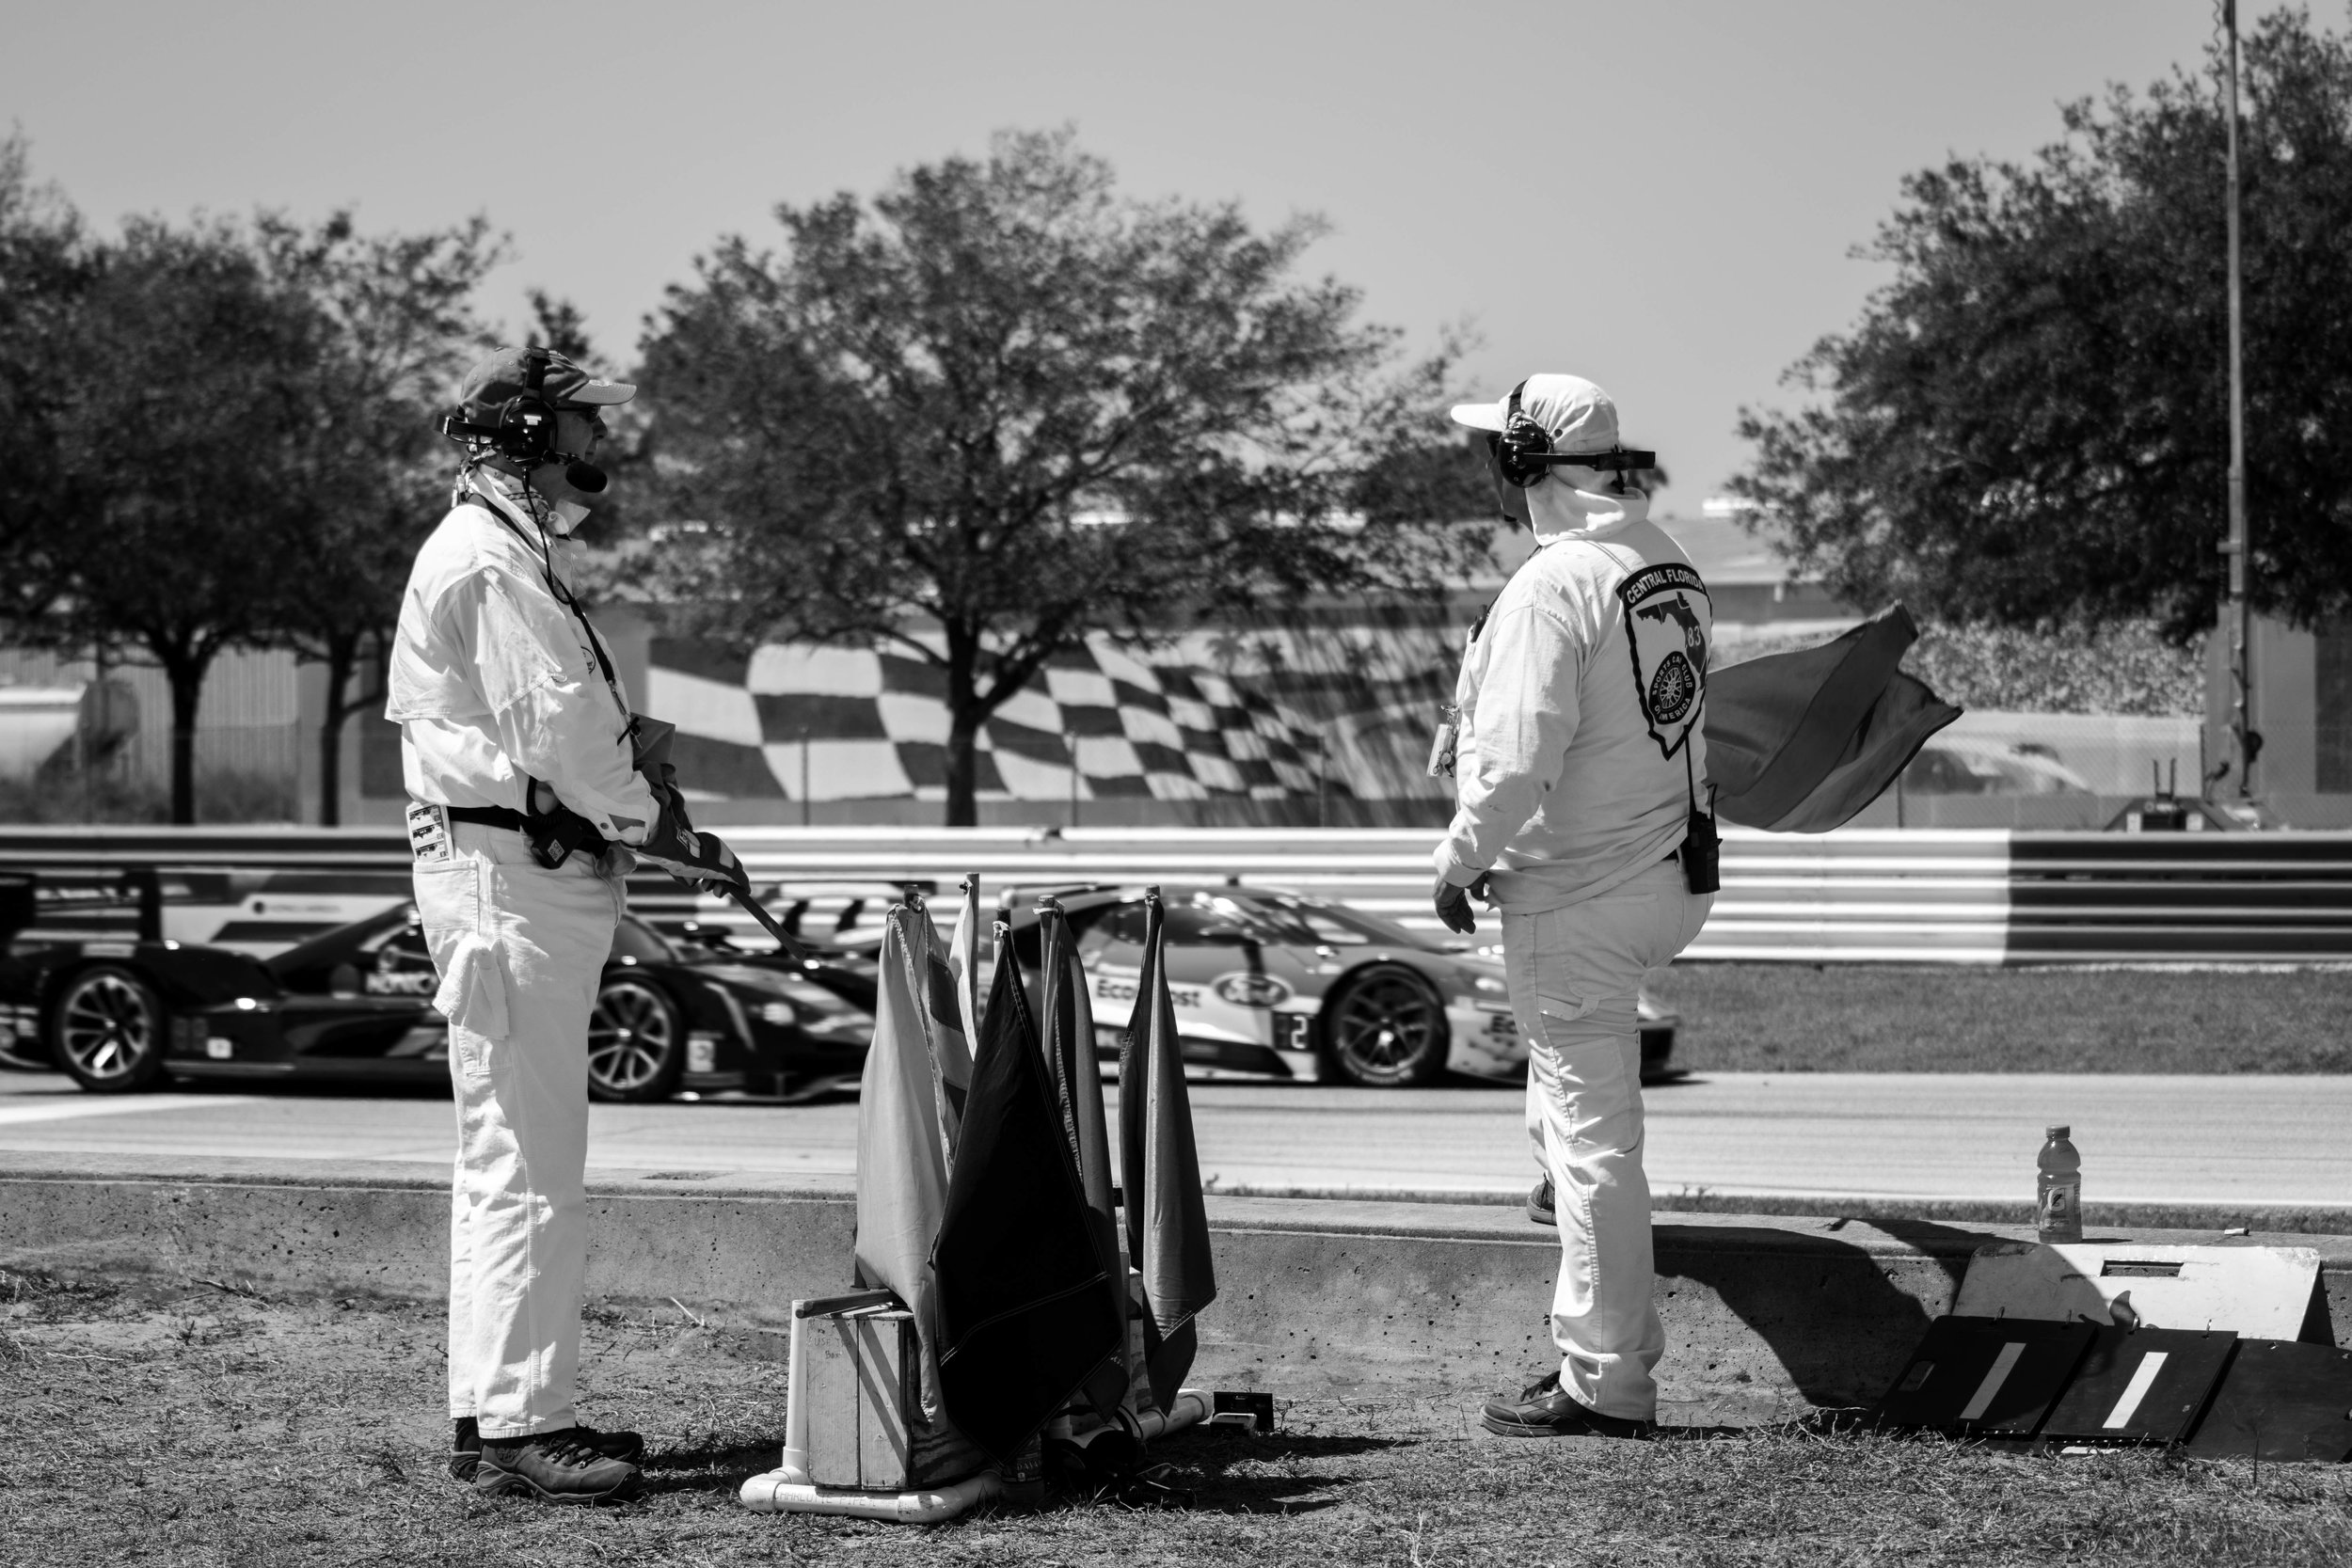 Sebring International Raceway, Sebring Florida